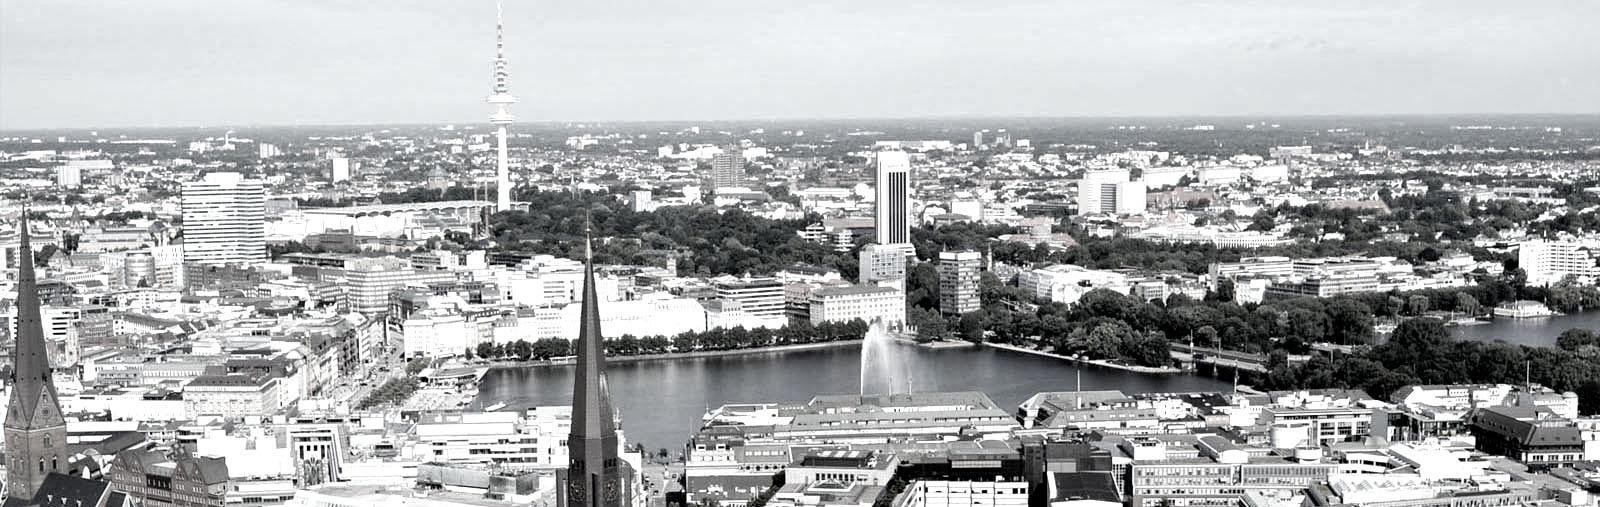 Hamburg Downton Office.